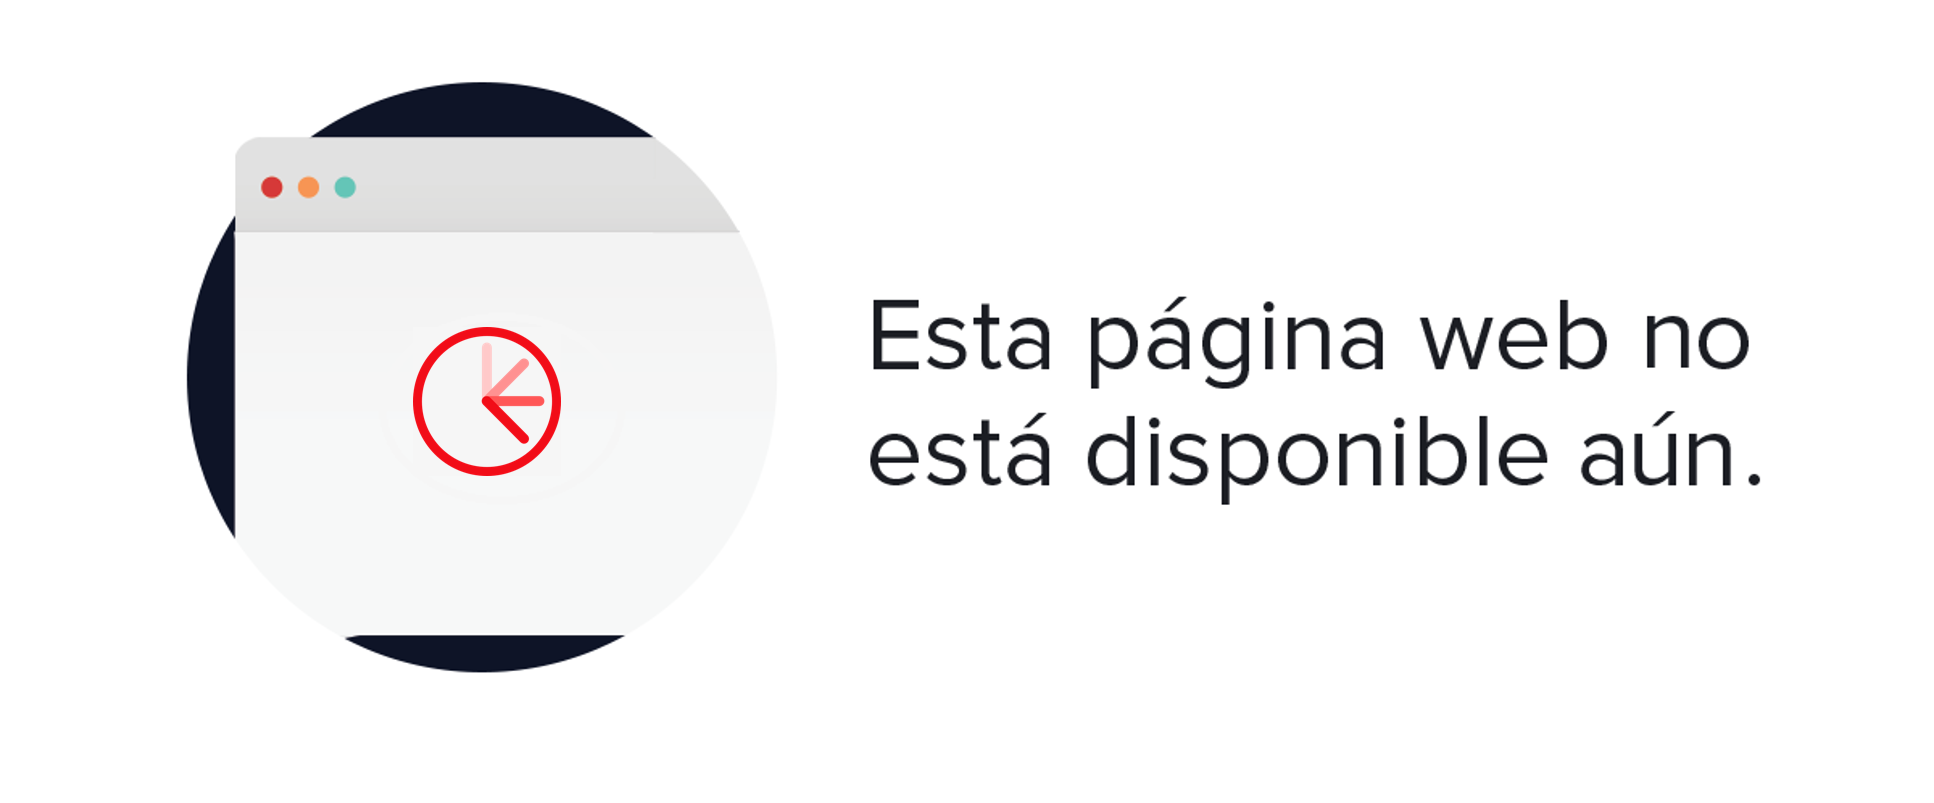 Adolfo Dominguez - Pantalón de mujer Adolfo Dominguez negro de pata de elefante Negro 8433917417036 - OAJHTSA